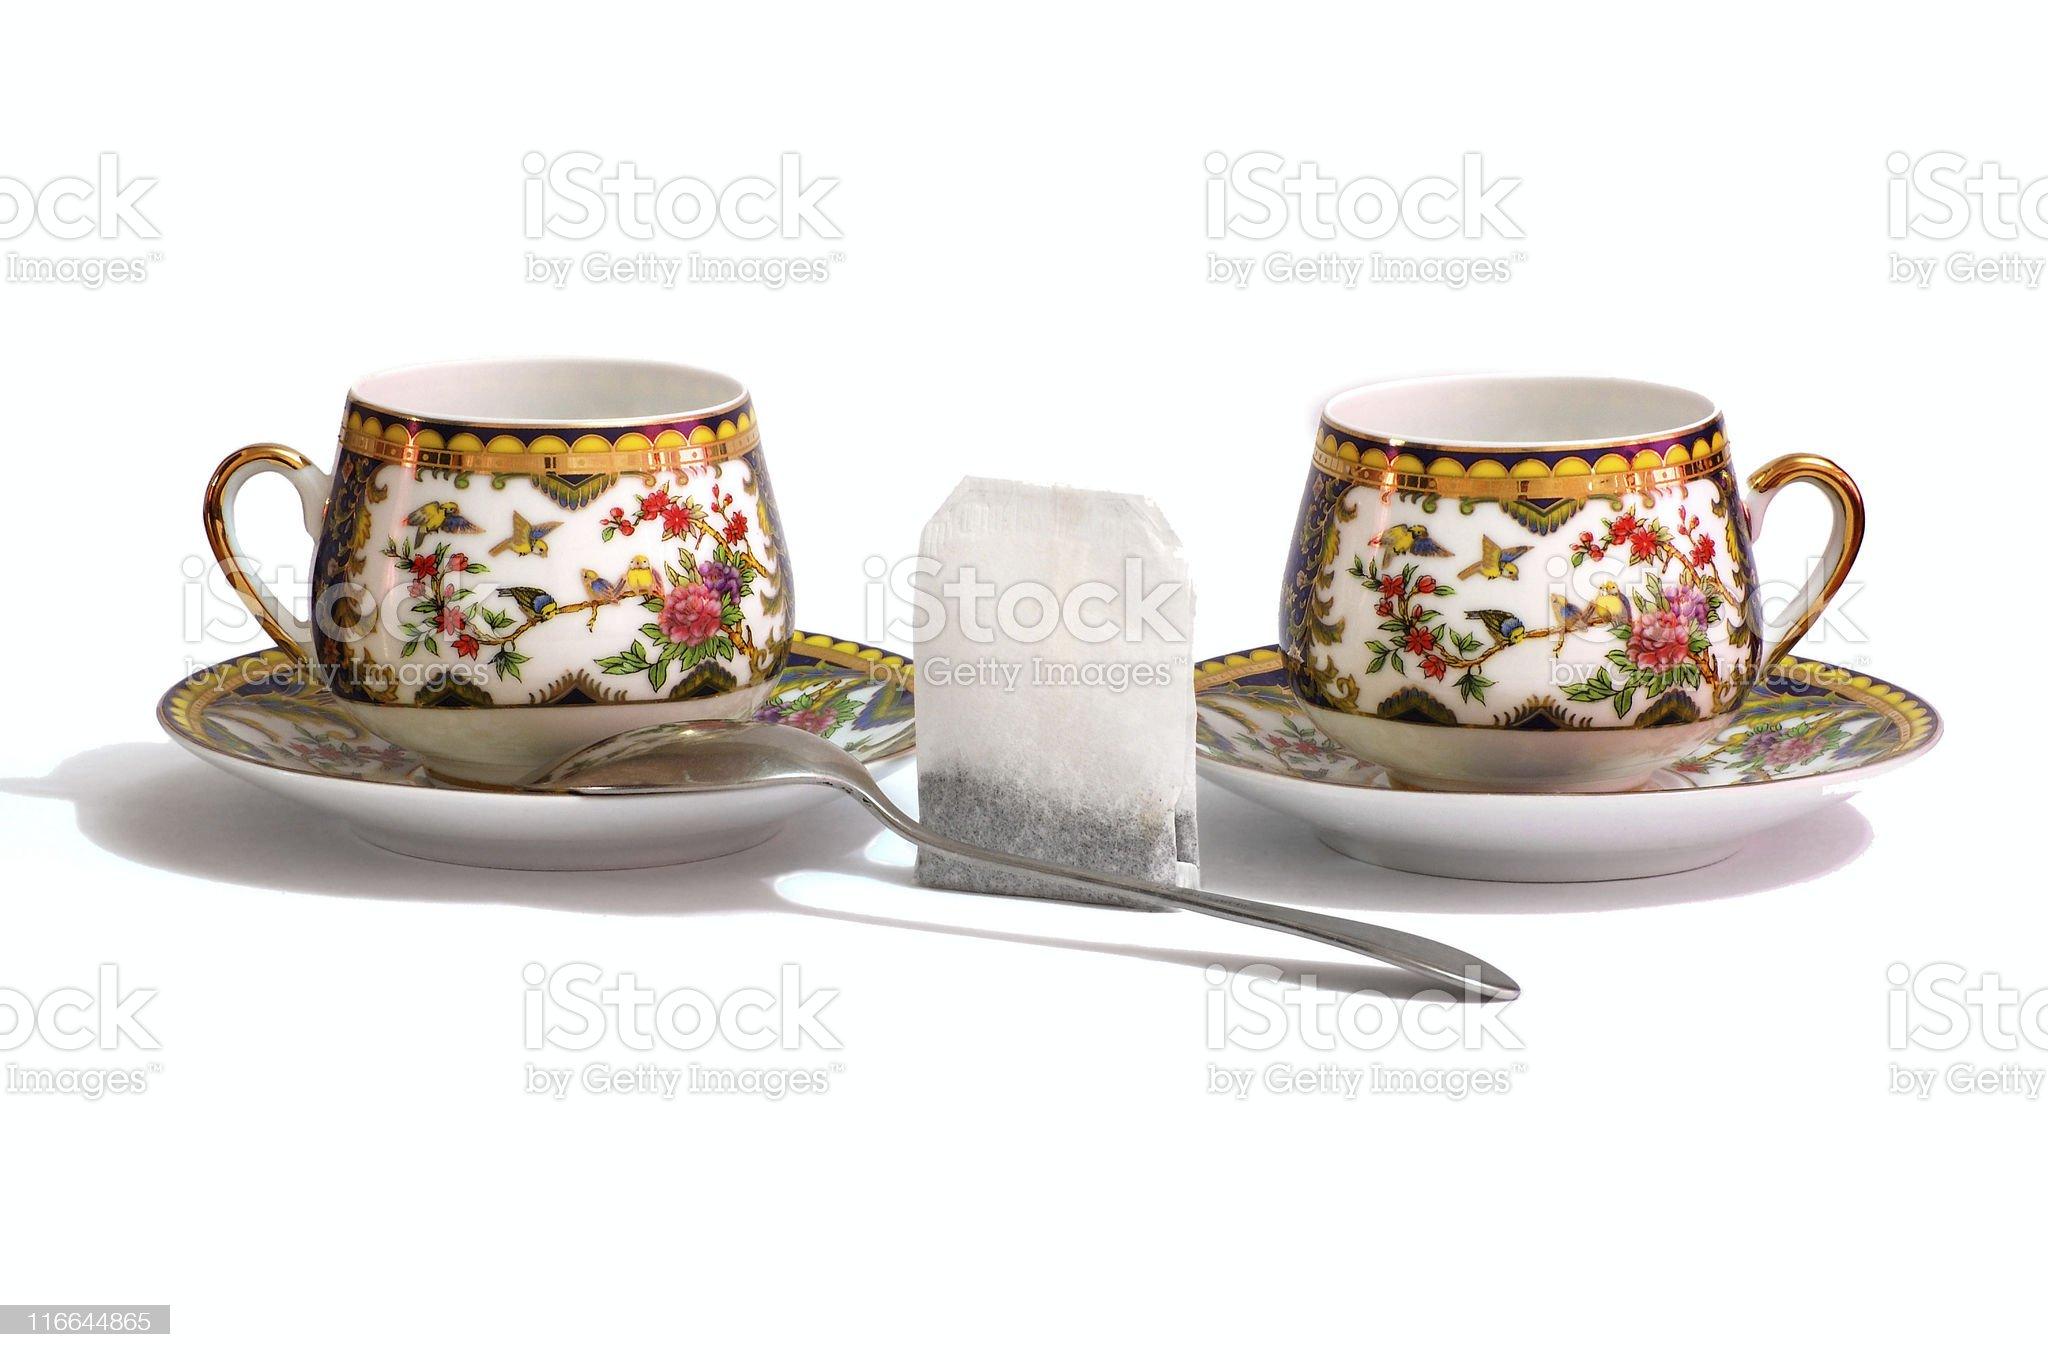 Tea composition royalty-free stock photo